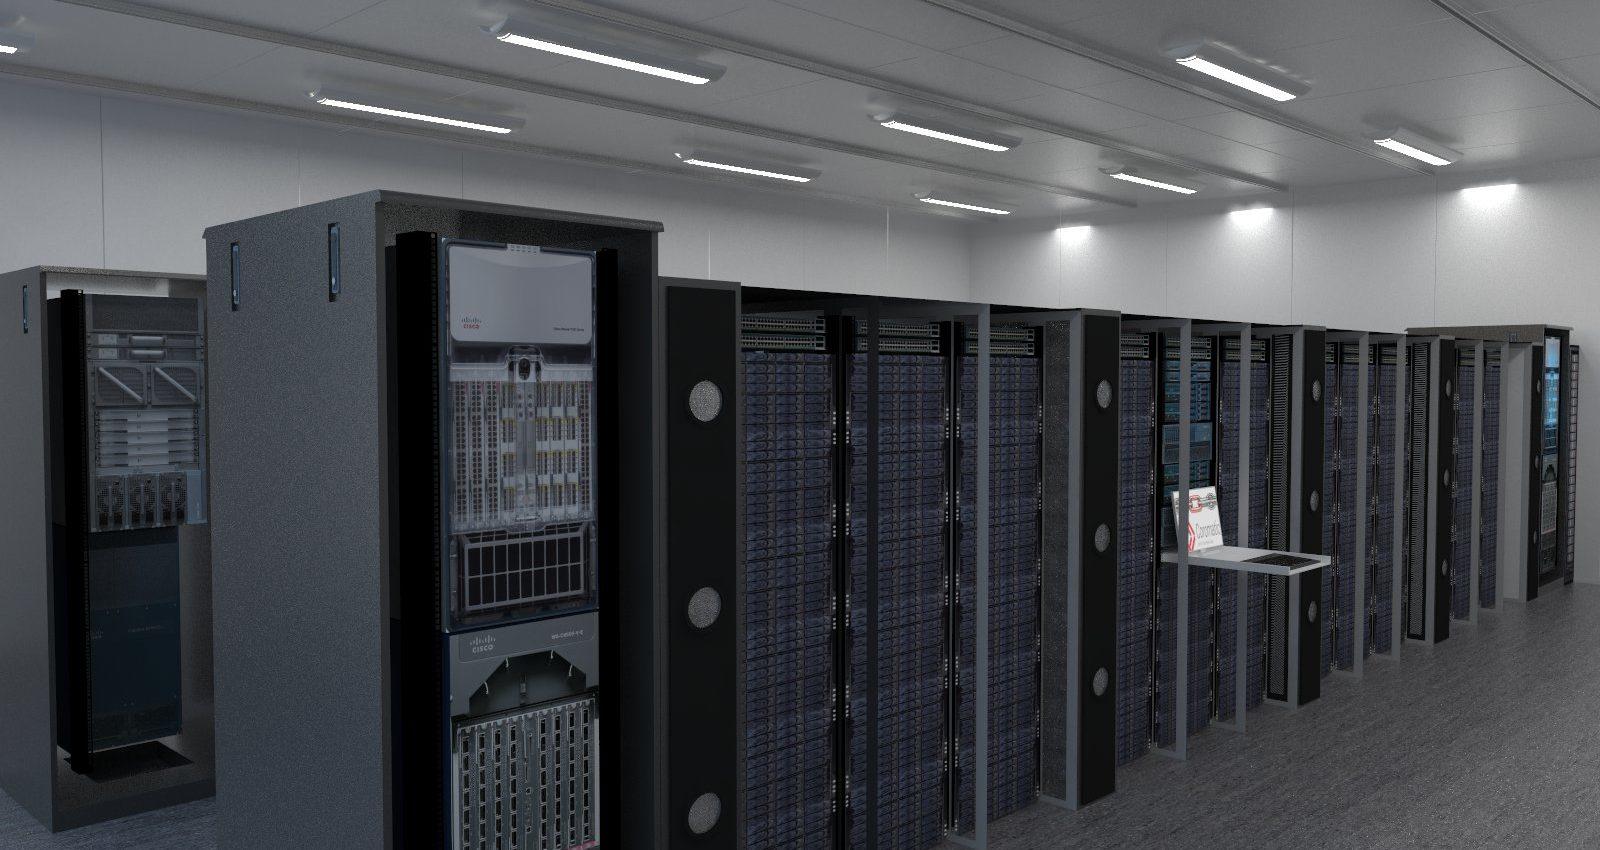 koncept-datacenter-3d-interor-1600x850